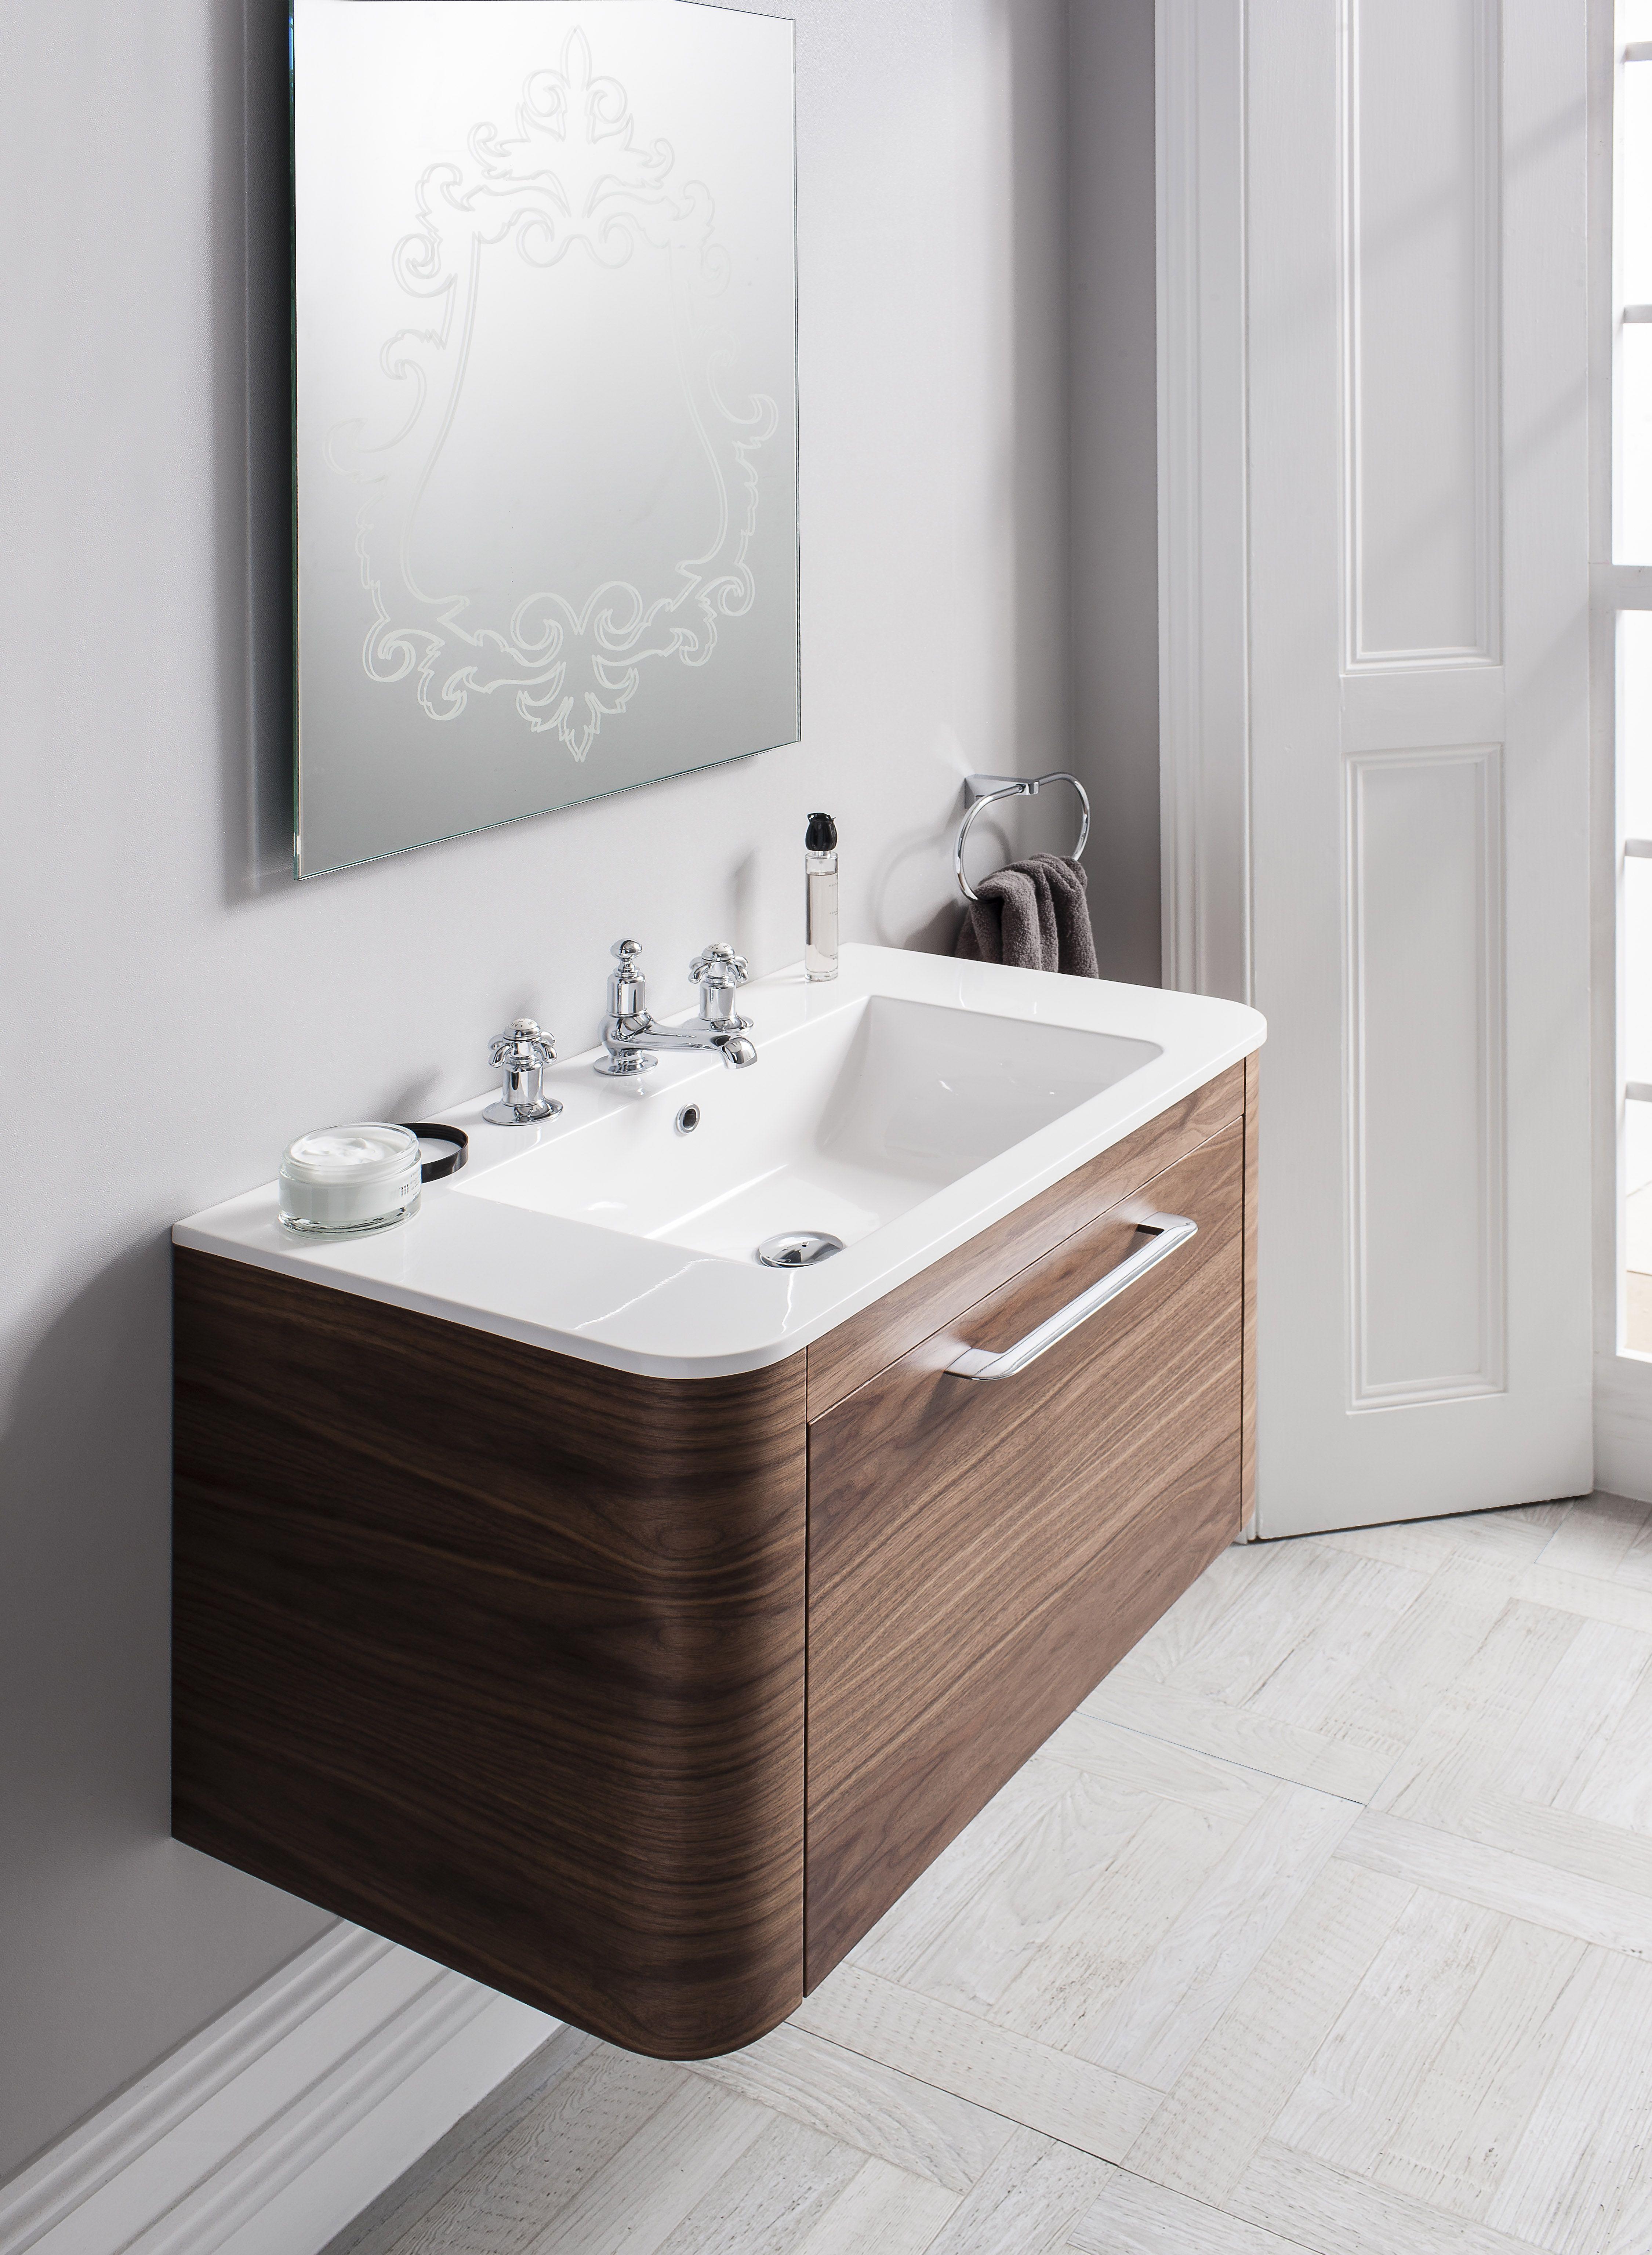 White Bathroom Units Eden 100 Wall Mounted Vanity Unit Black And White Bathroom Ideas